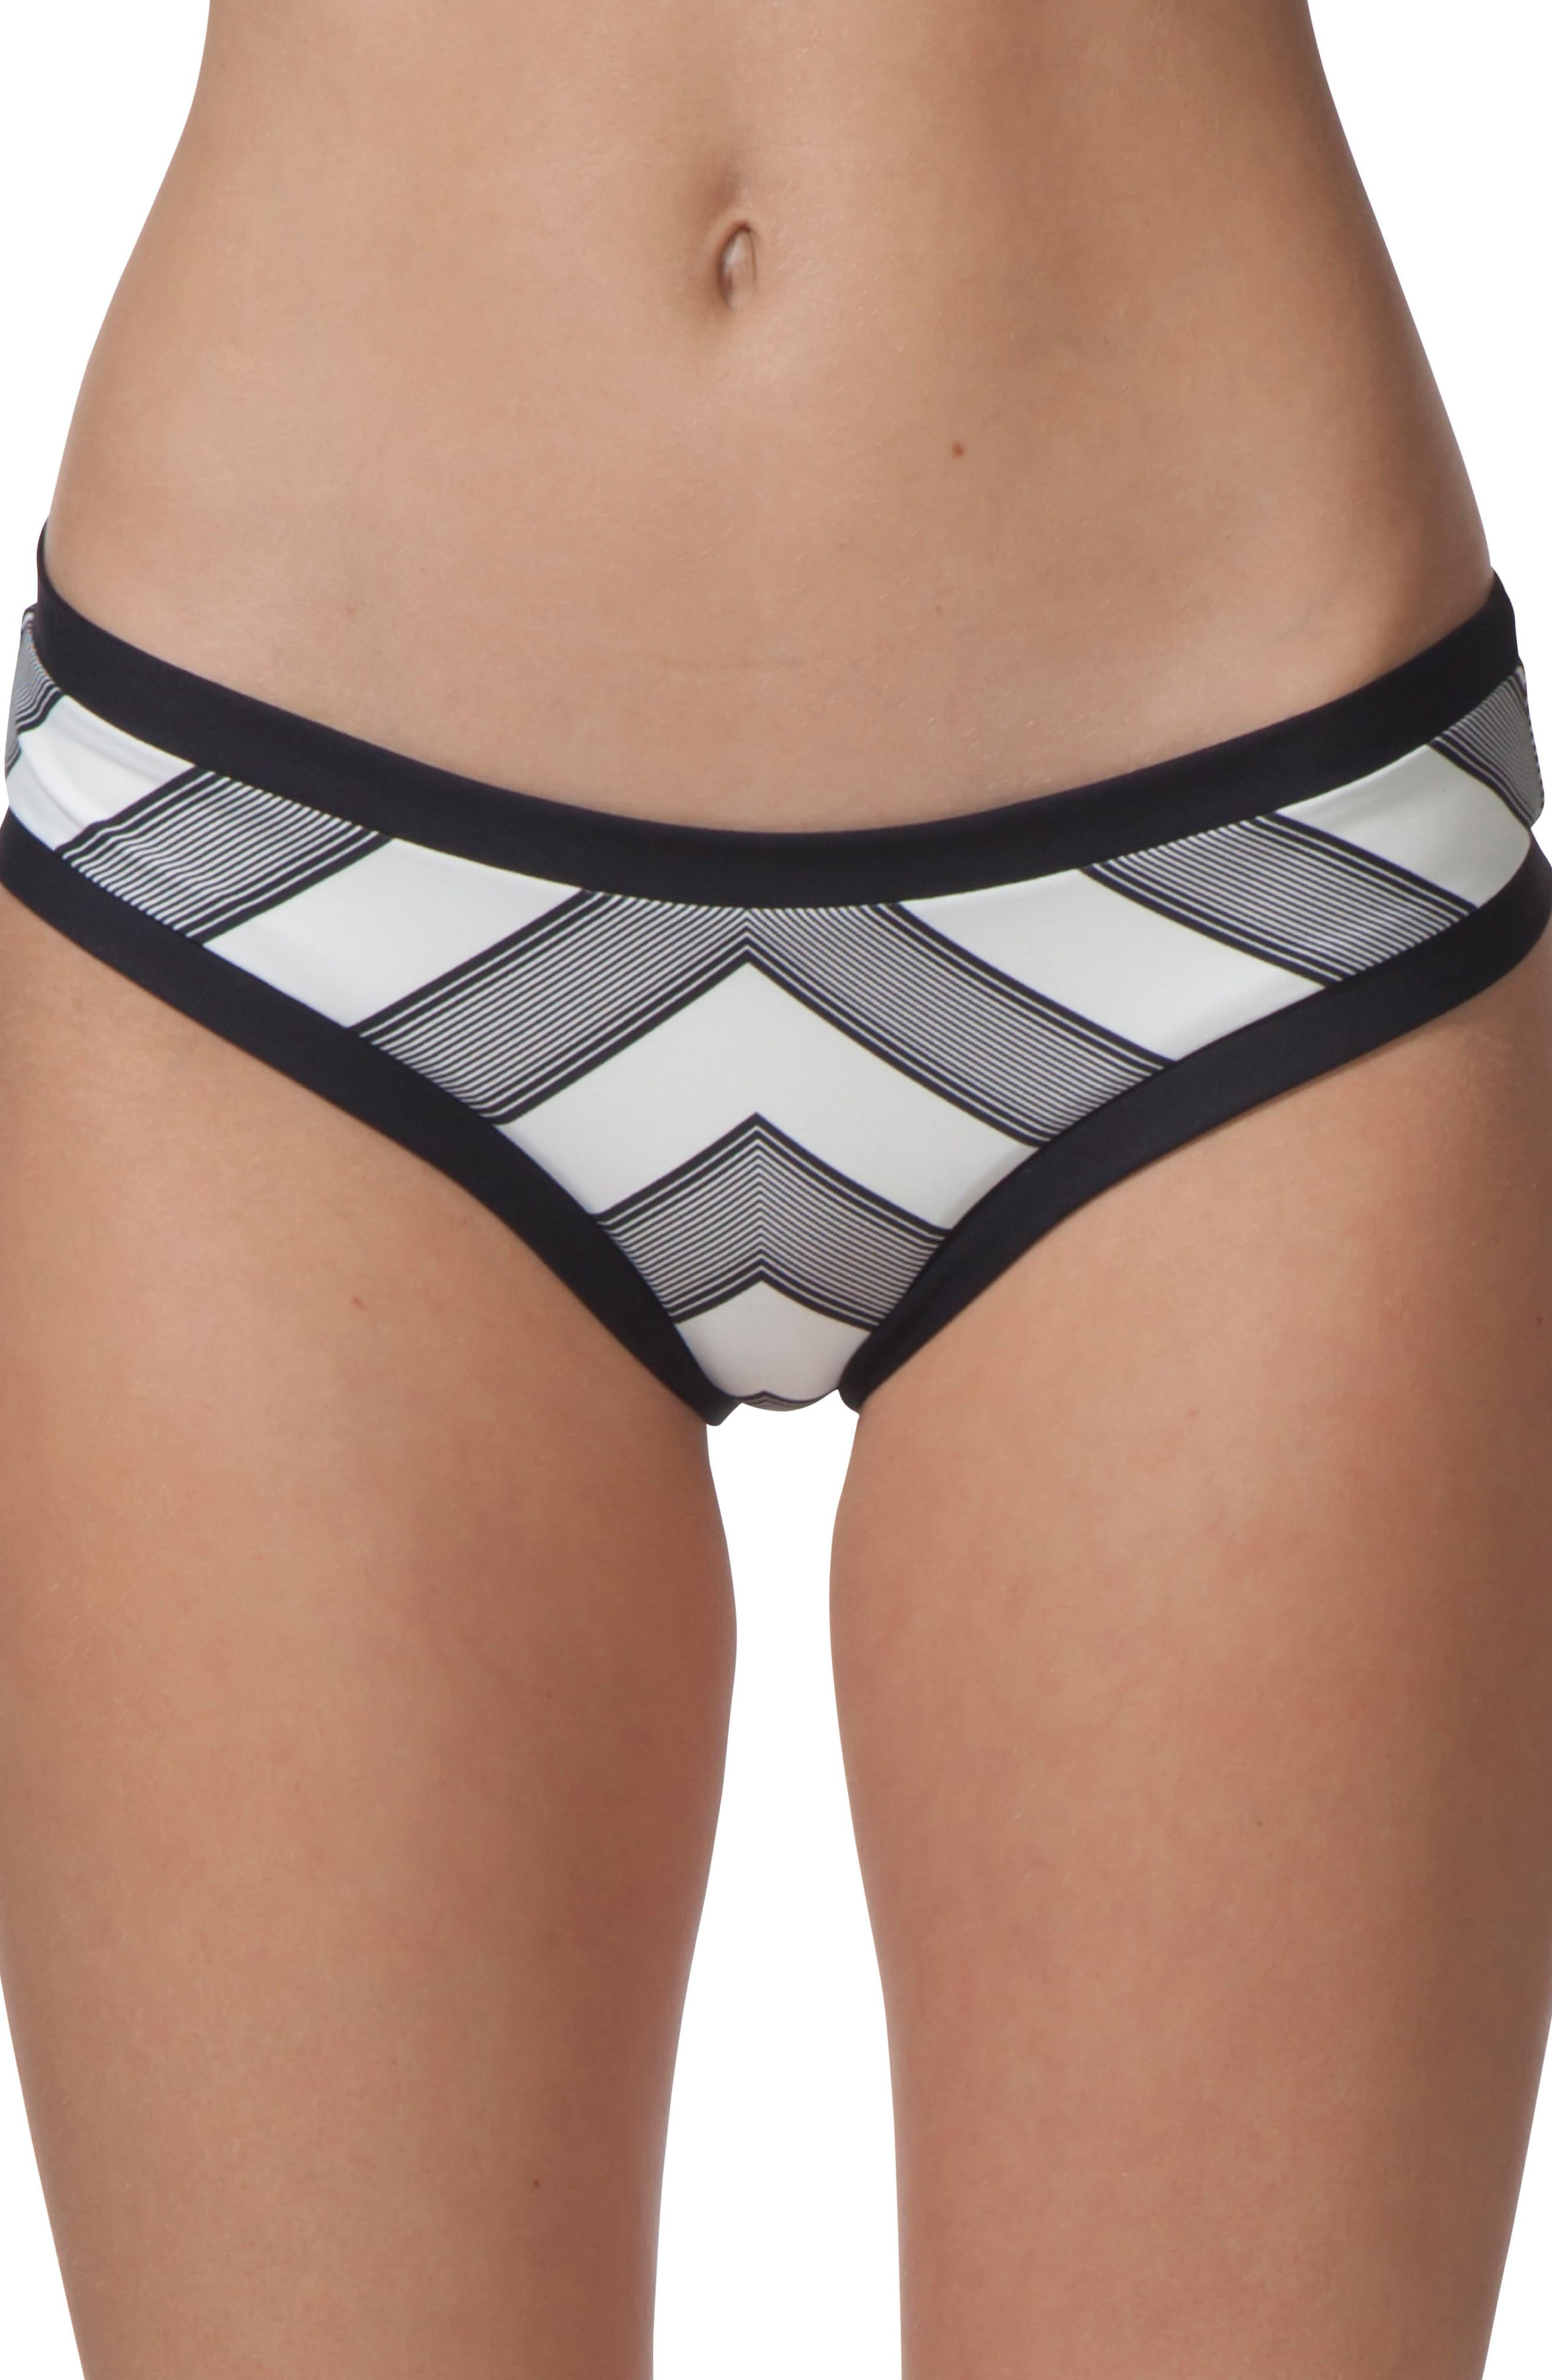 Mirage Line Up Hipster Bikini Bottoms,                             Main thumbnail 1, color,                             Black